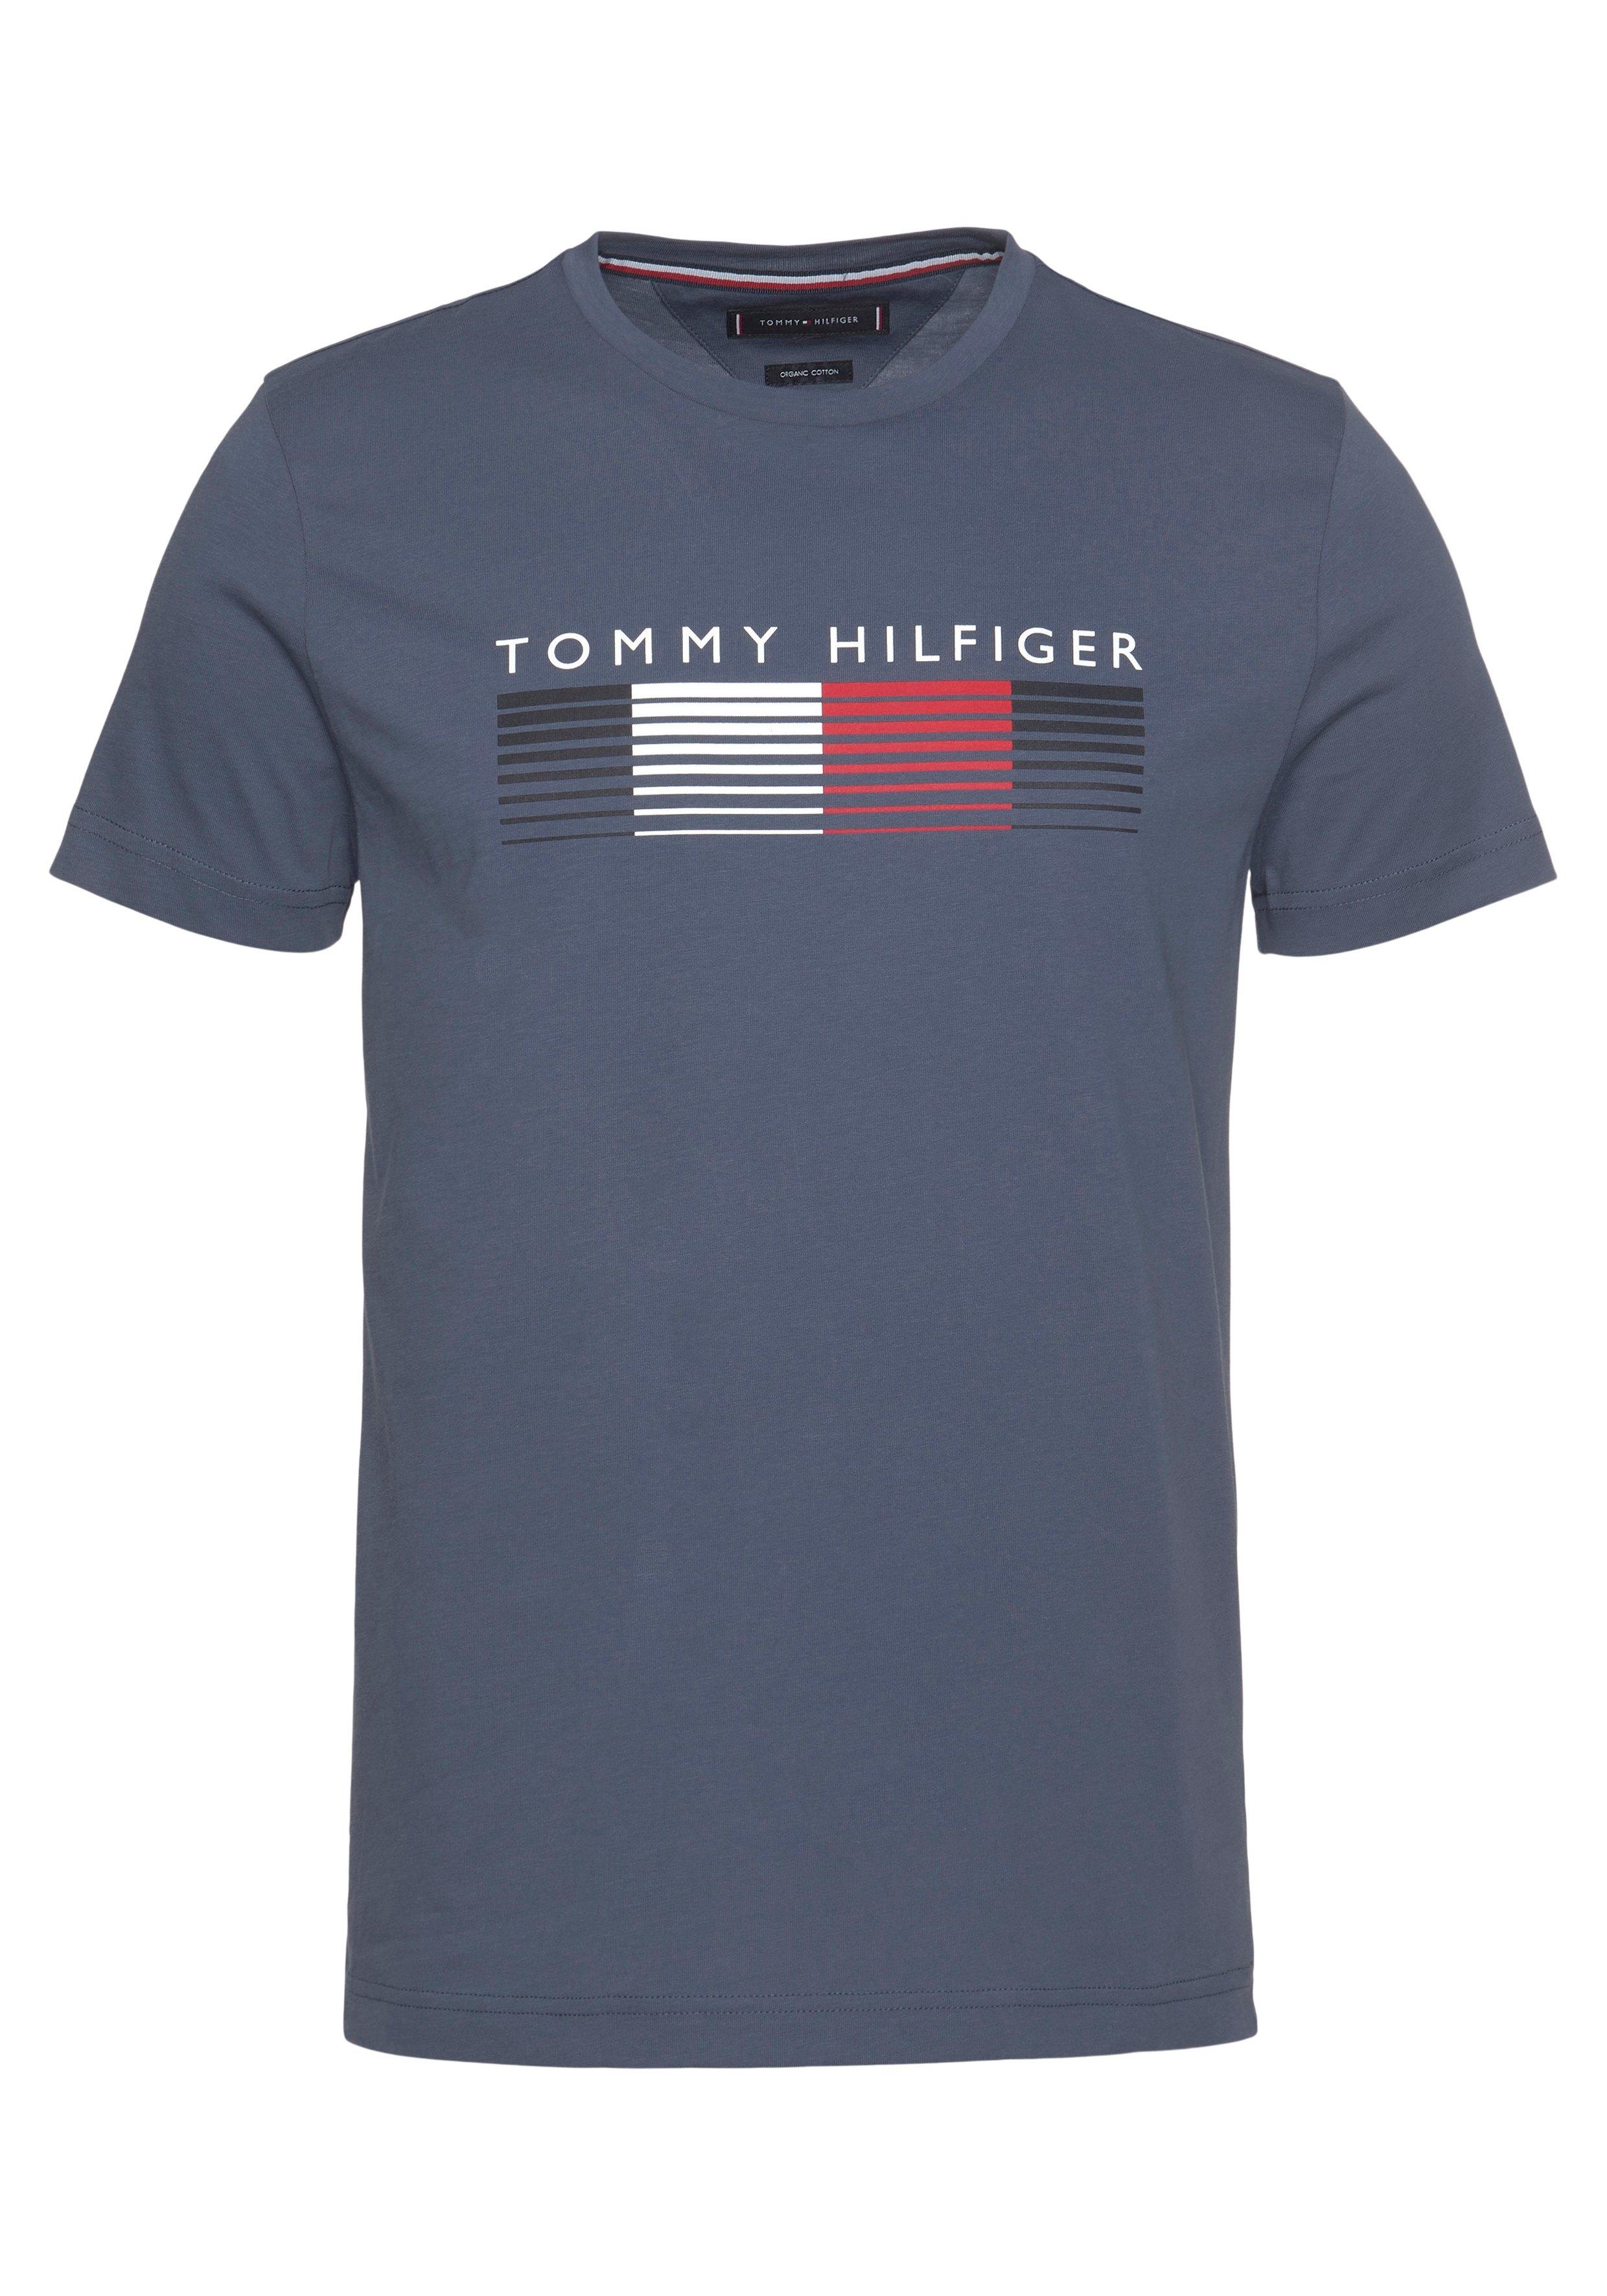 Tommy Hilfiger T-shirt FADE GRAPHIC CORP TEE - verschillende betaalmethodes